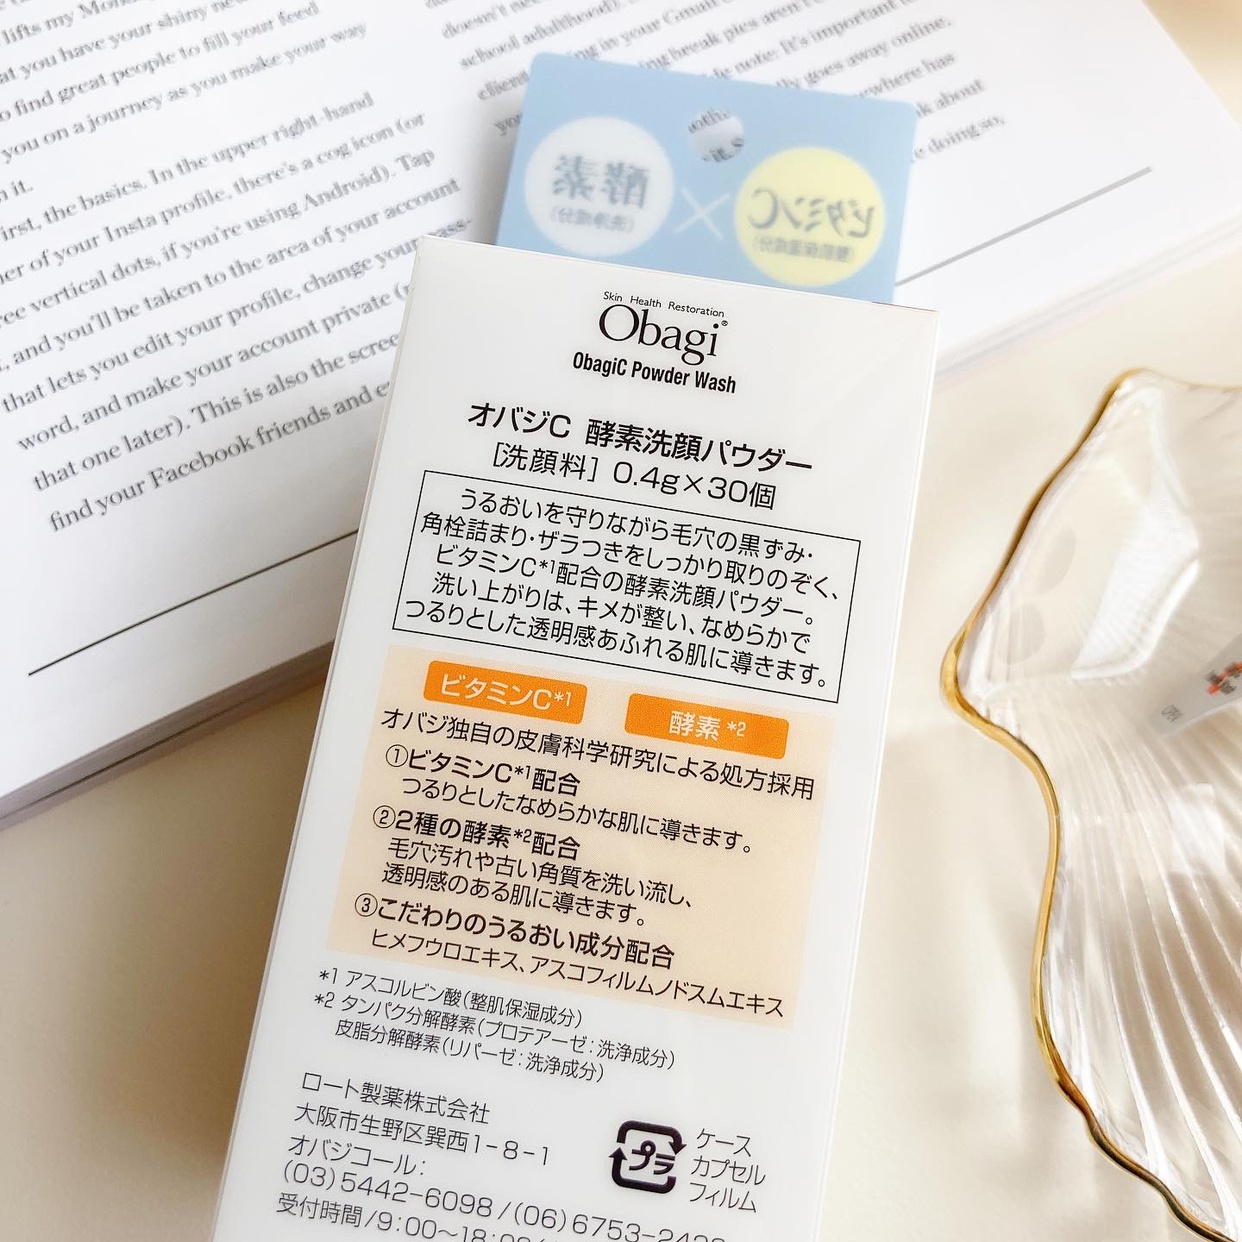 Obagi(オバジ) オバジC 酵素洗顔パウダーを使ったぴこさんのクチコミ画像3